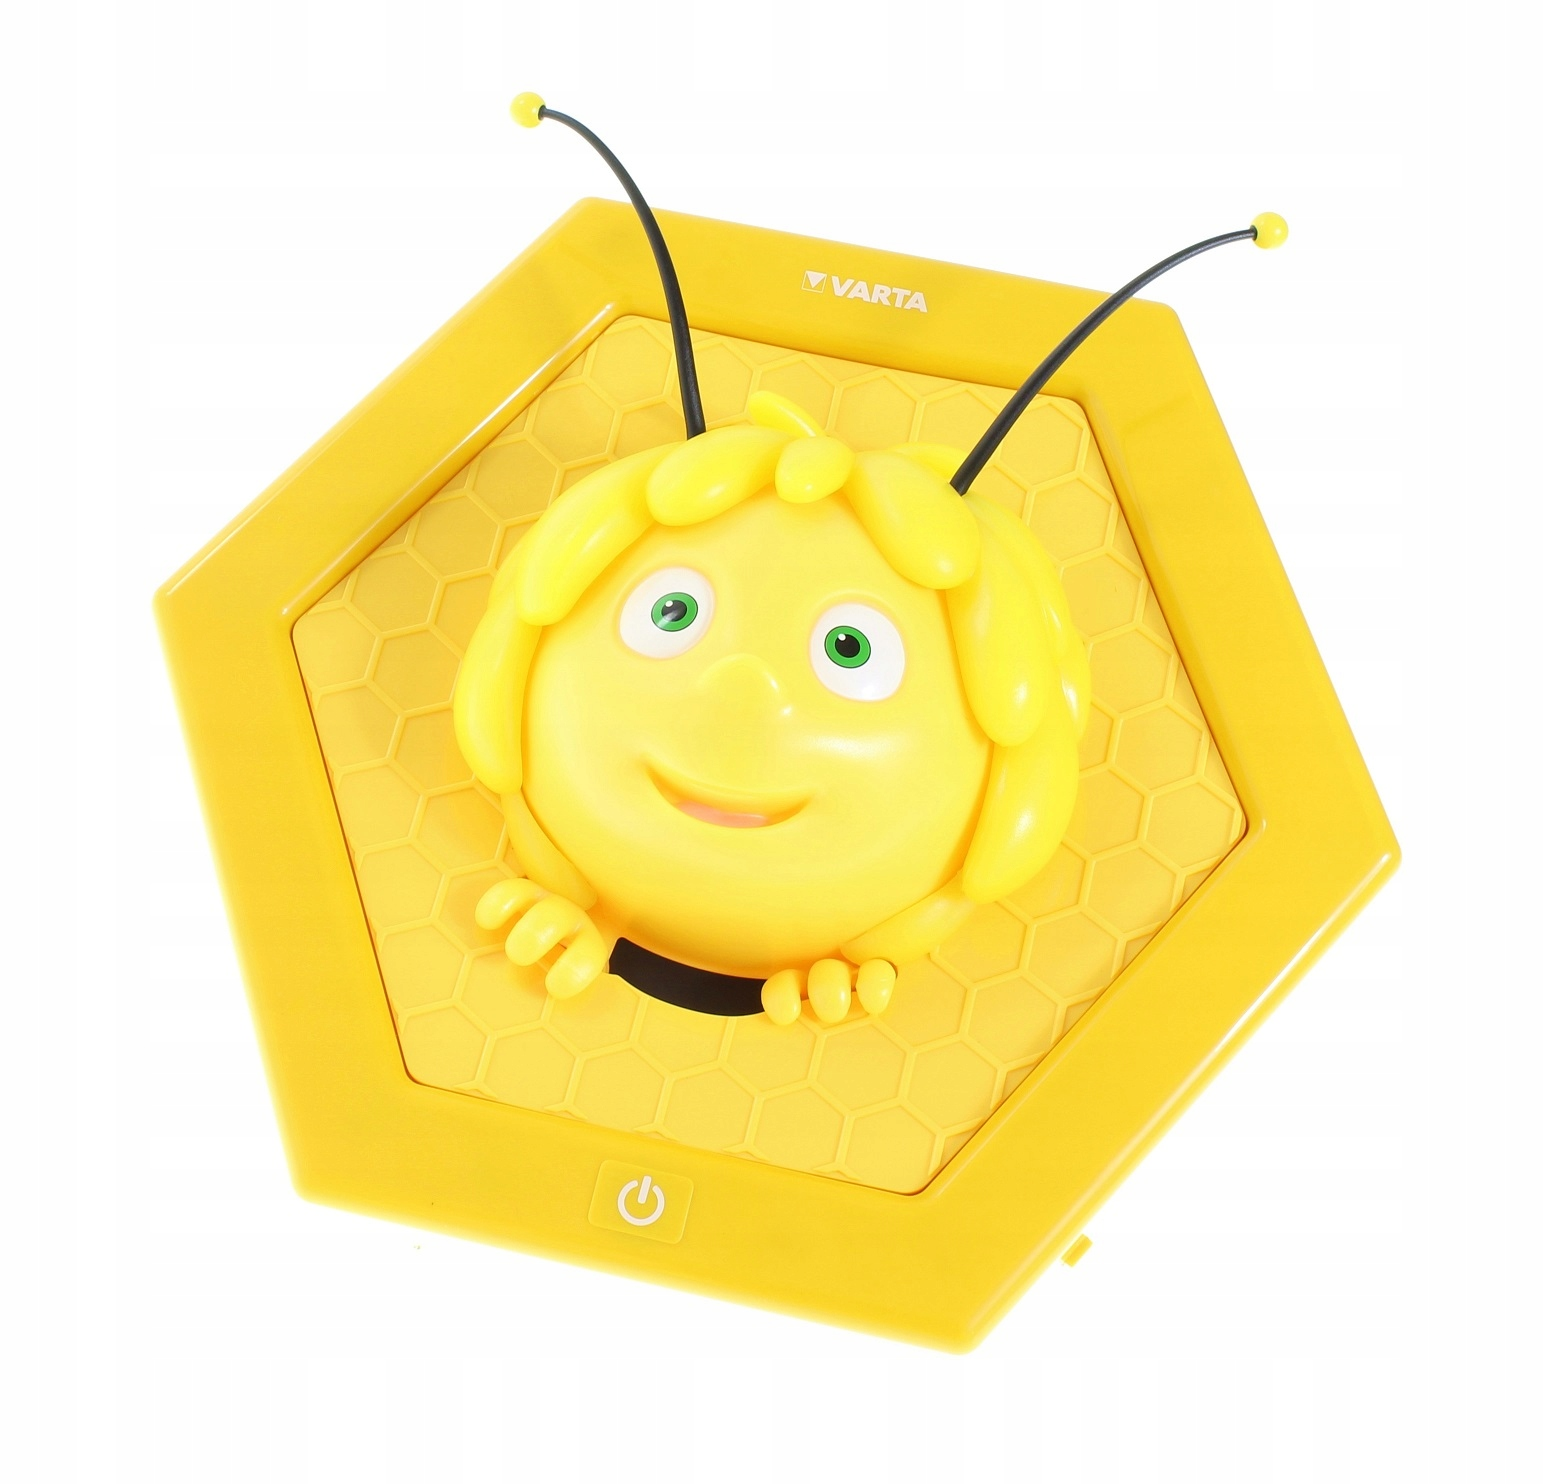 Lampka Nocna LED Pszczoła na baterie 2 tryby TIMER